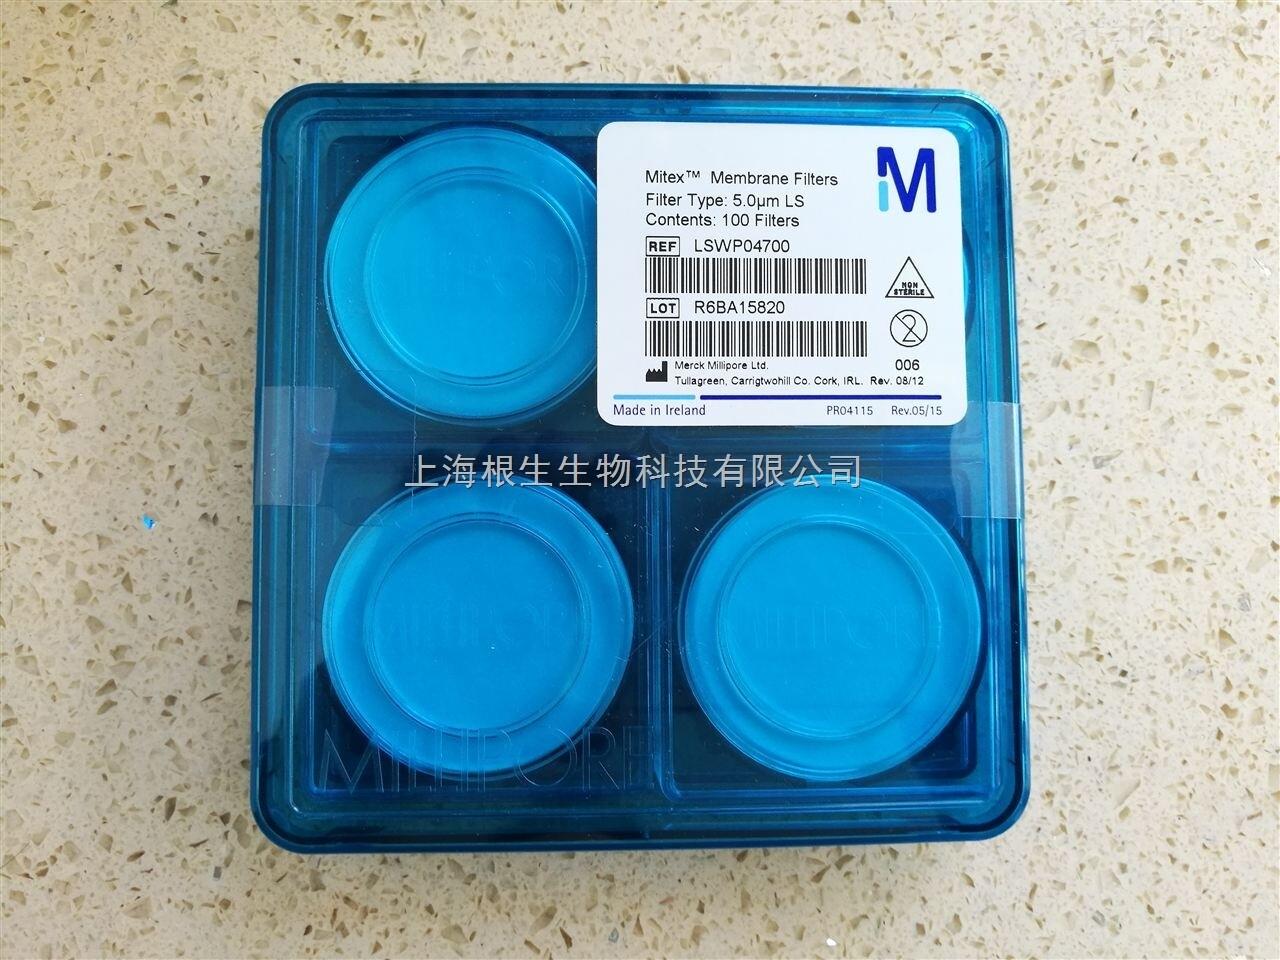 Millipore疏水聚四氟乙烯Mitex滤膜5um孔径LSWP04700